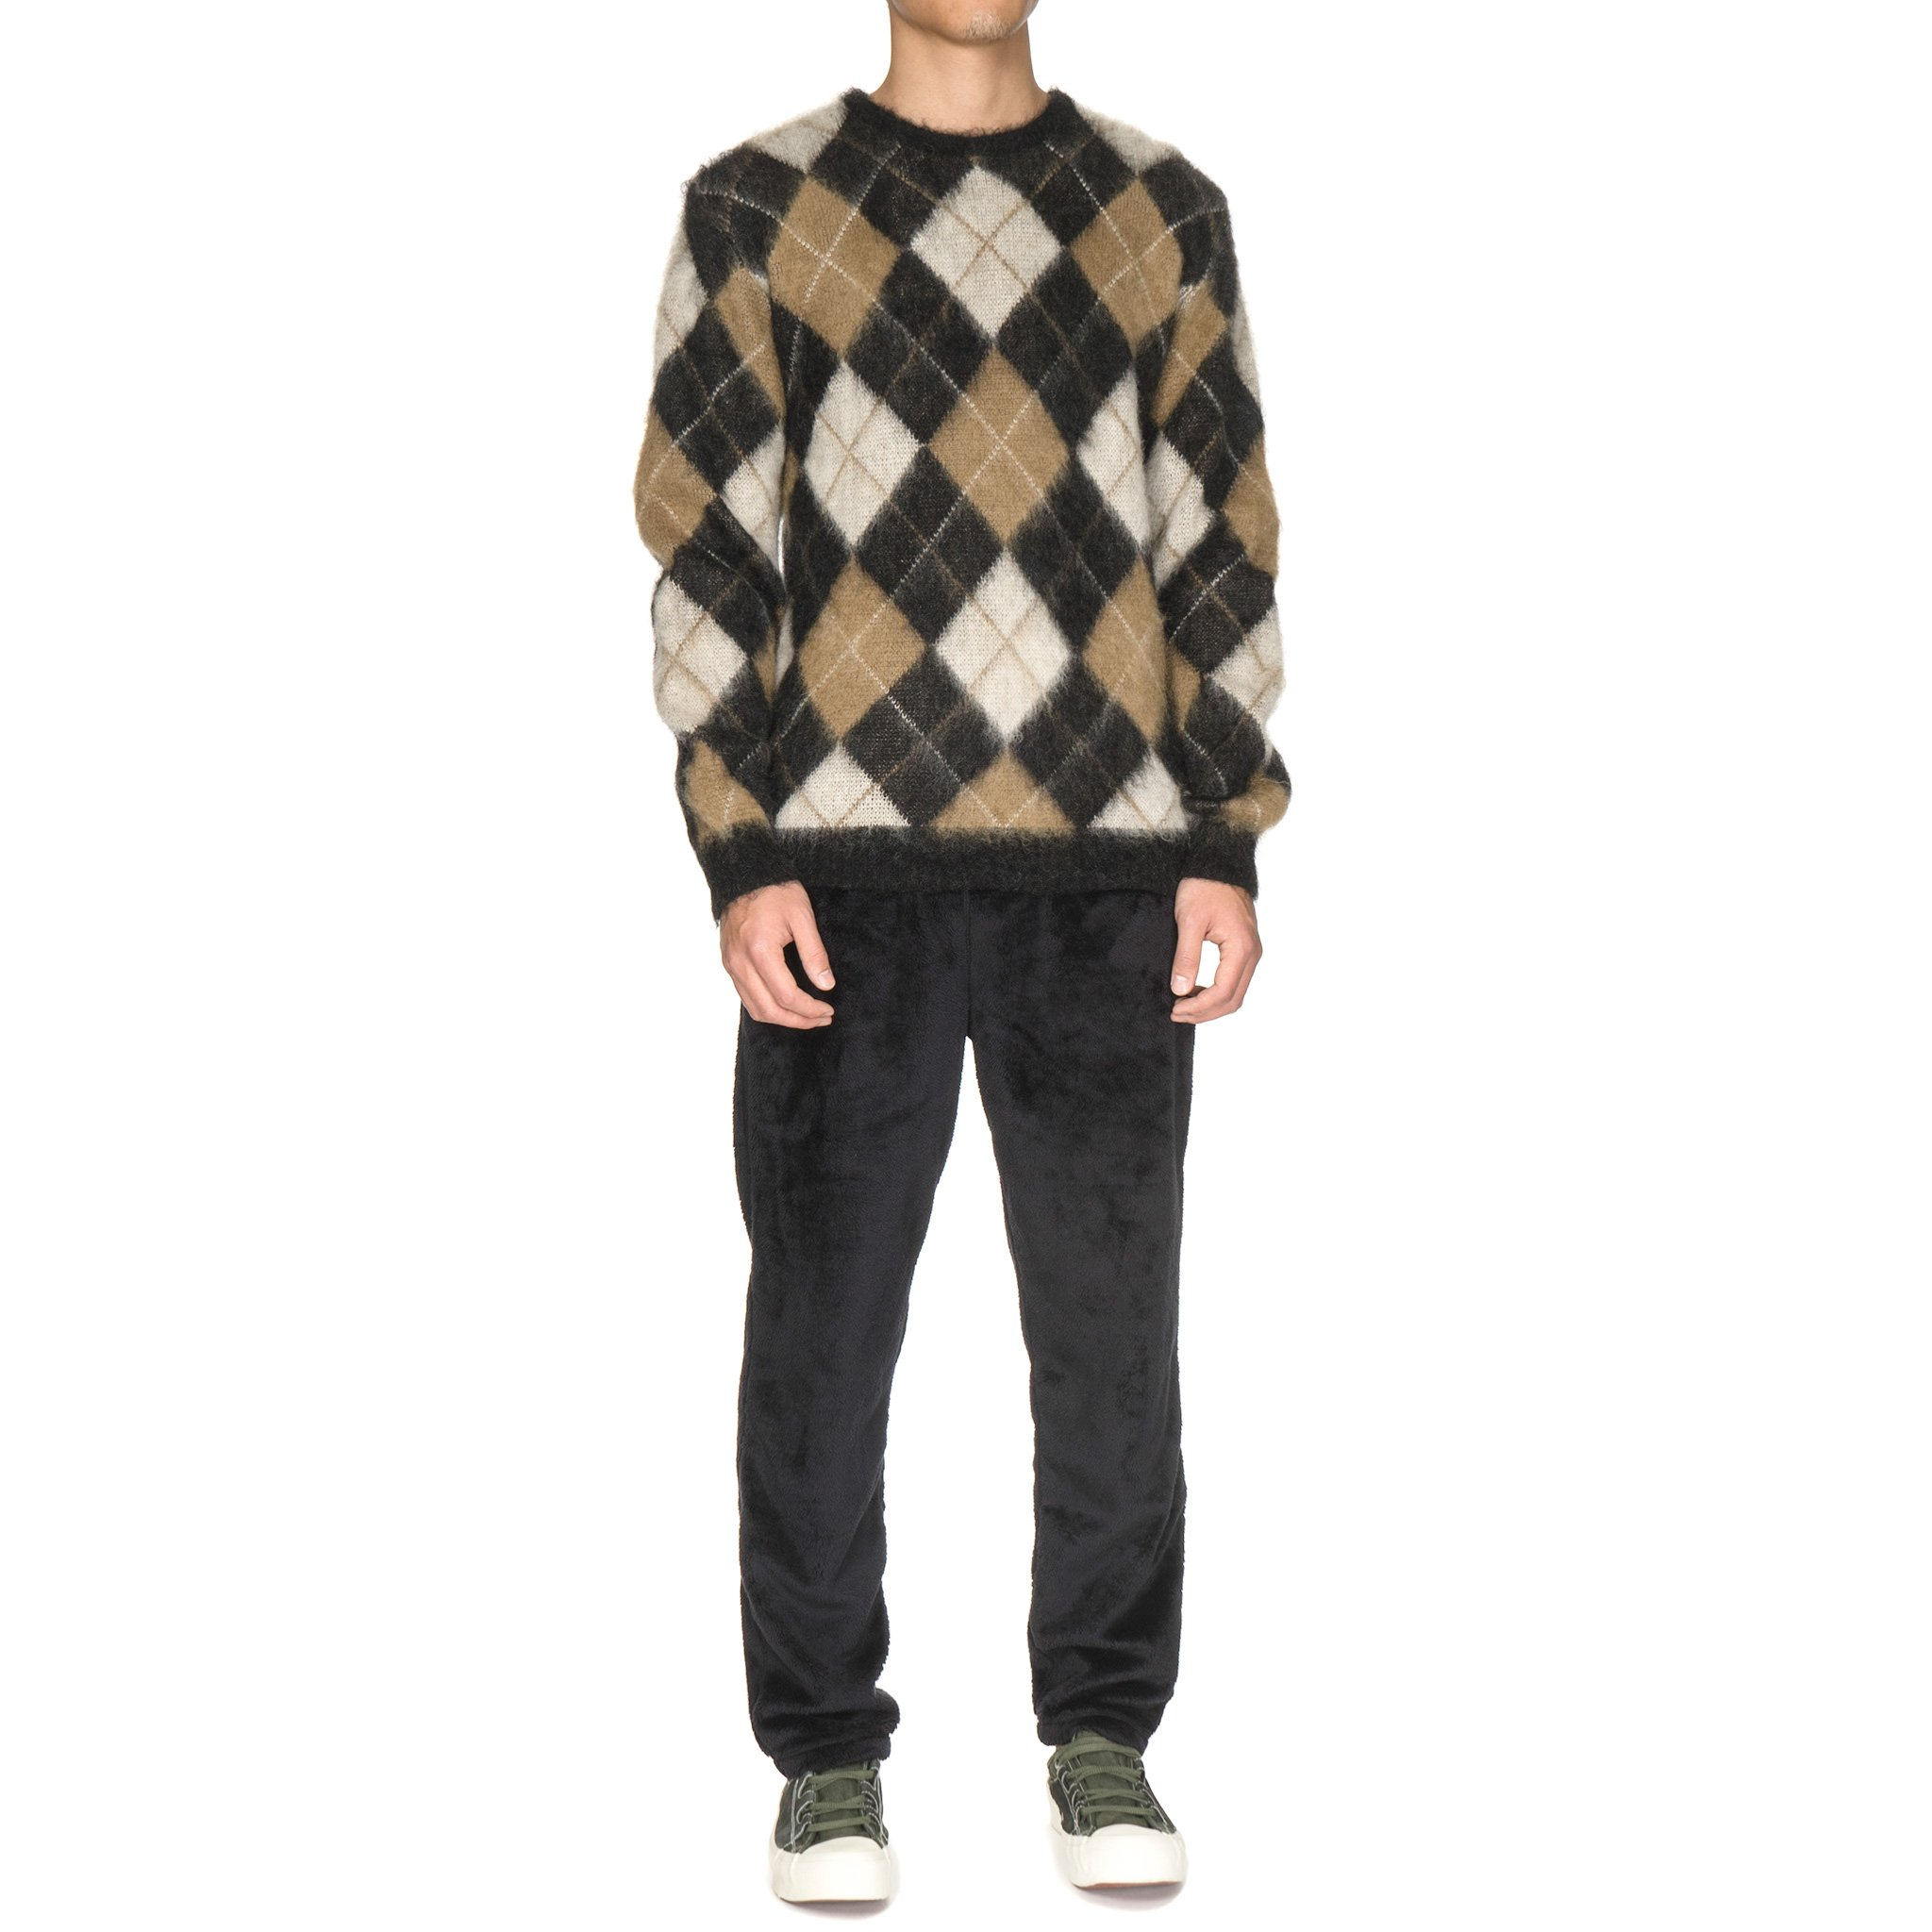 Needles-Mohair-Sweater-Argyle-Black-4_2048x2048.jpg